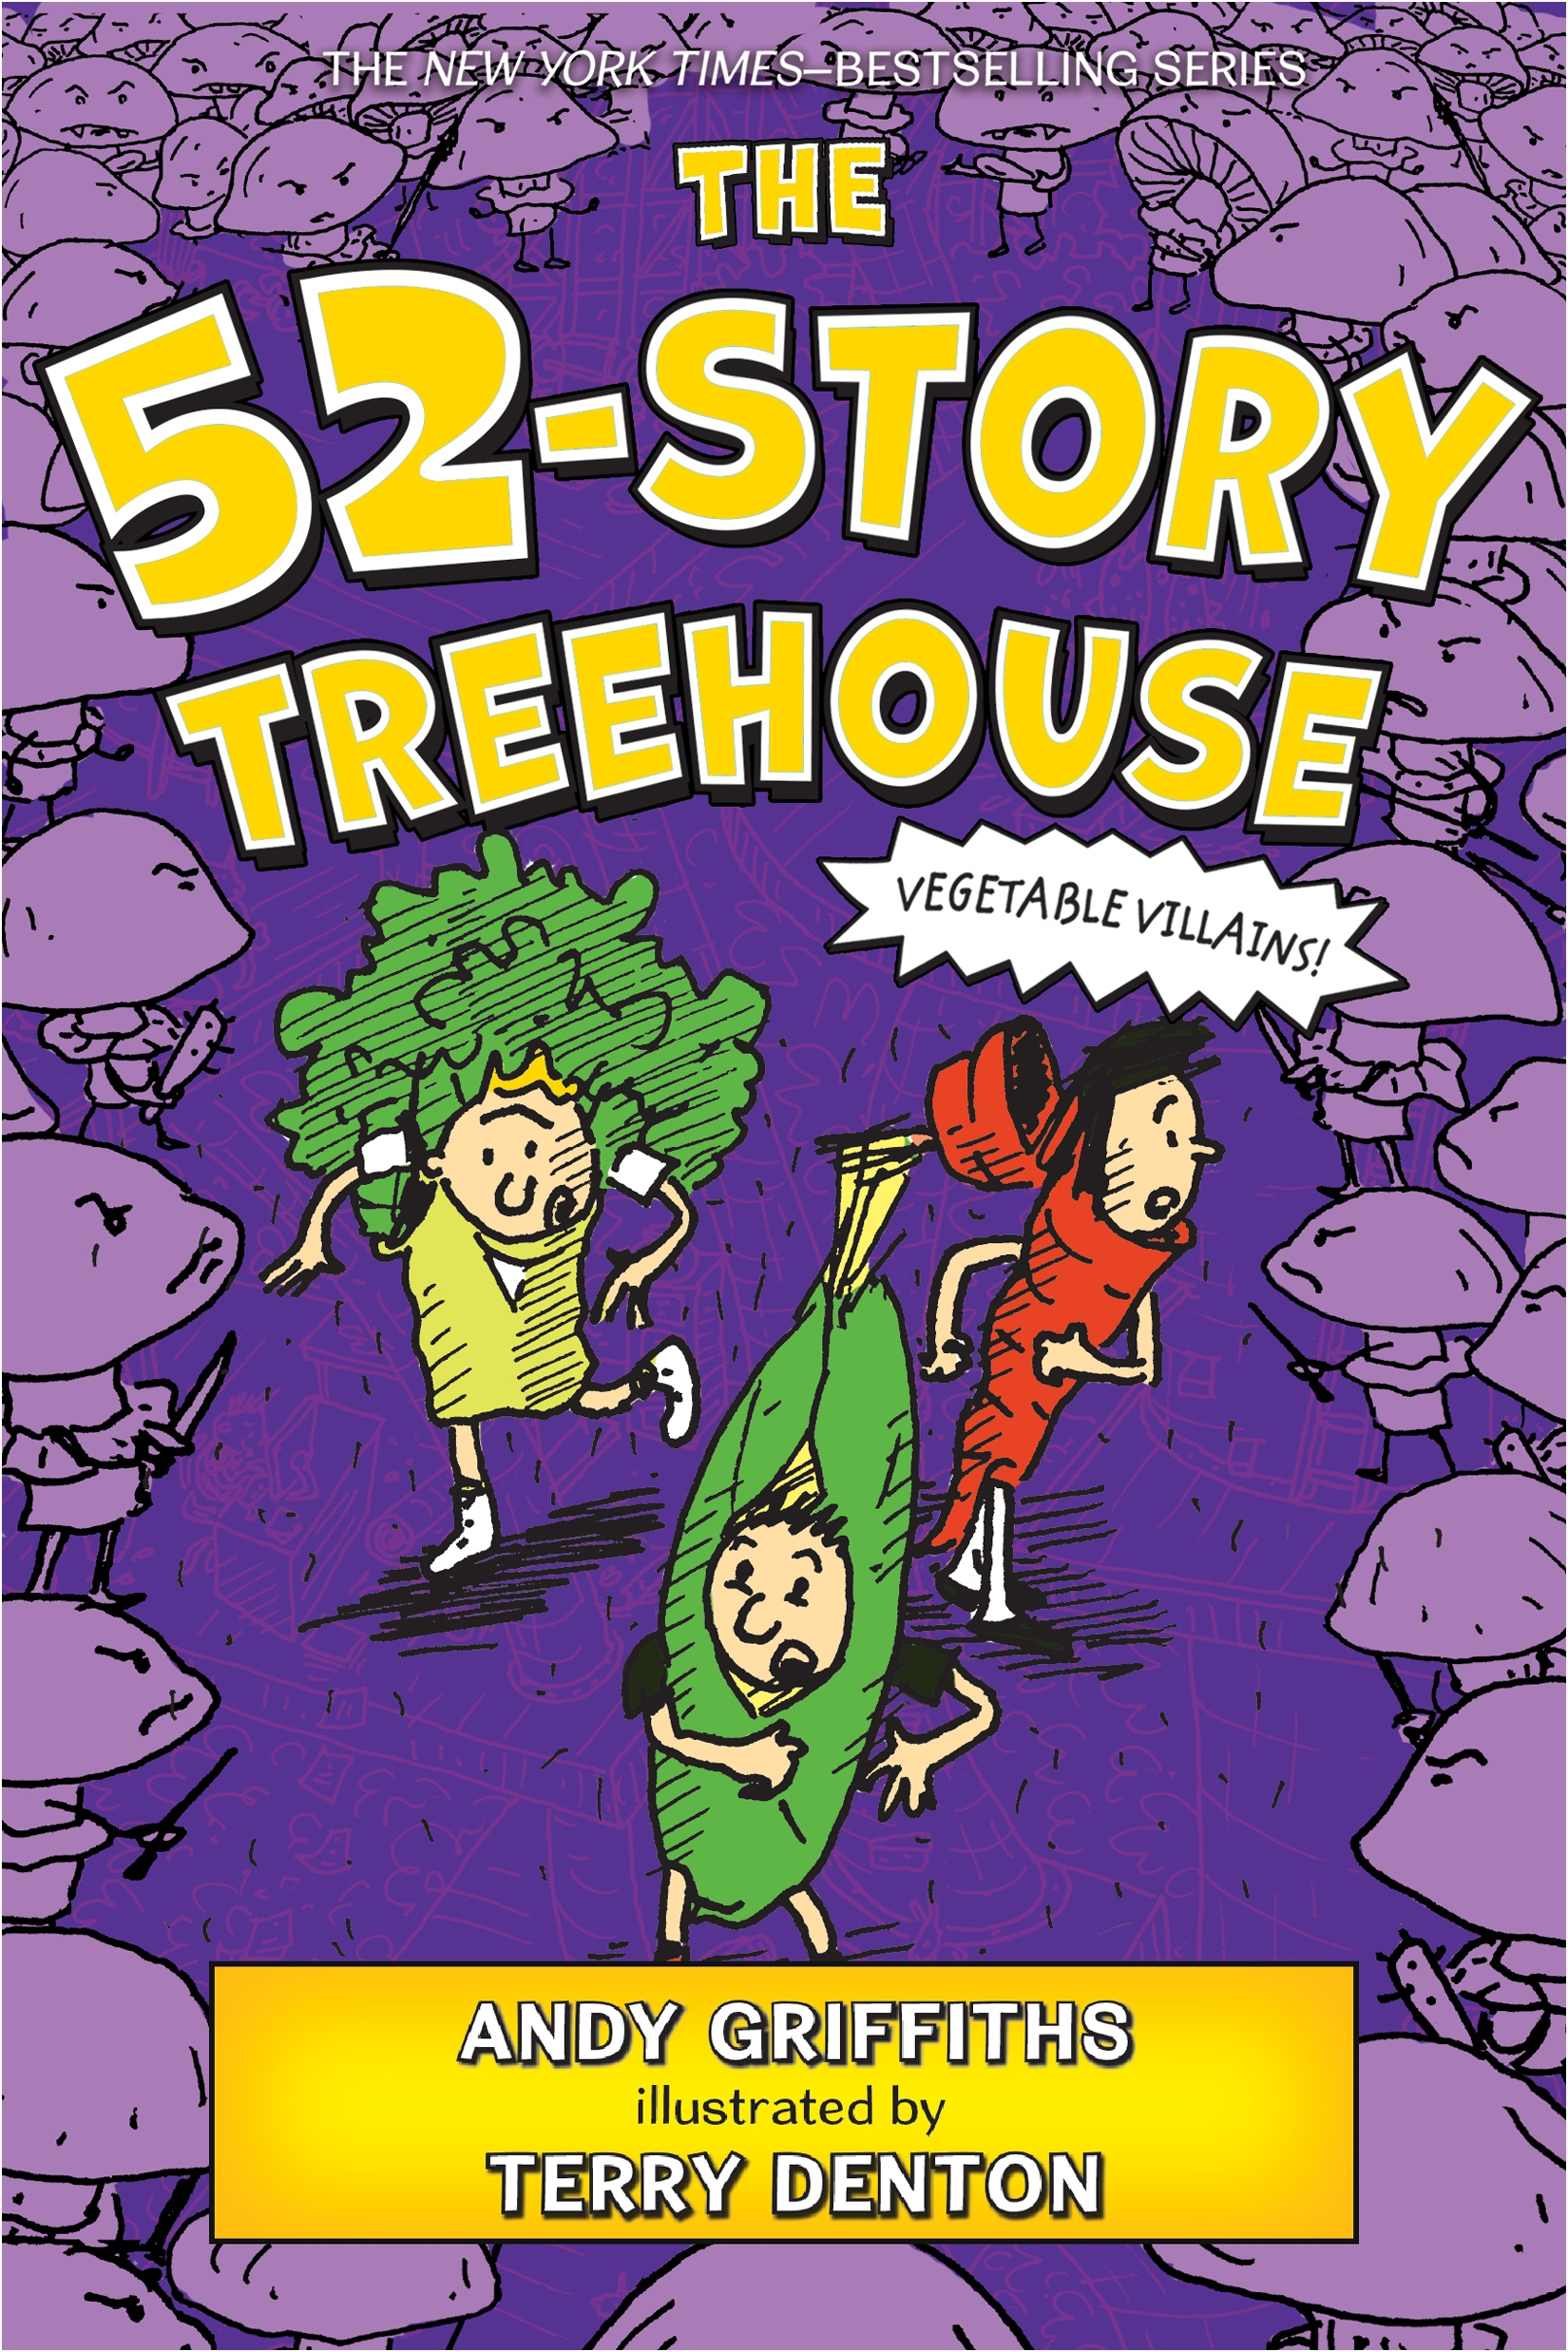 The 52-Story Treehouse Vegetable Villains!